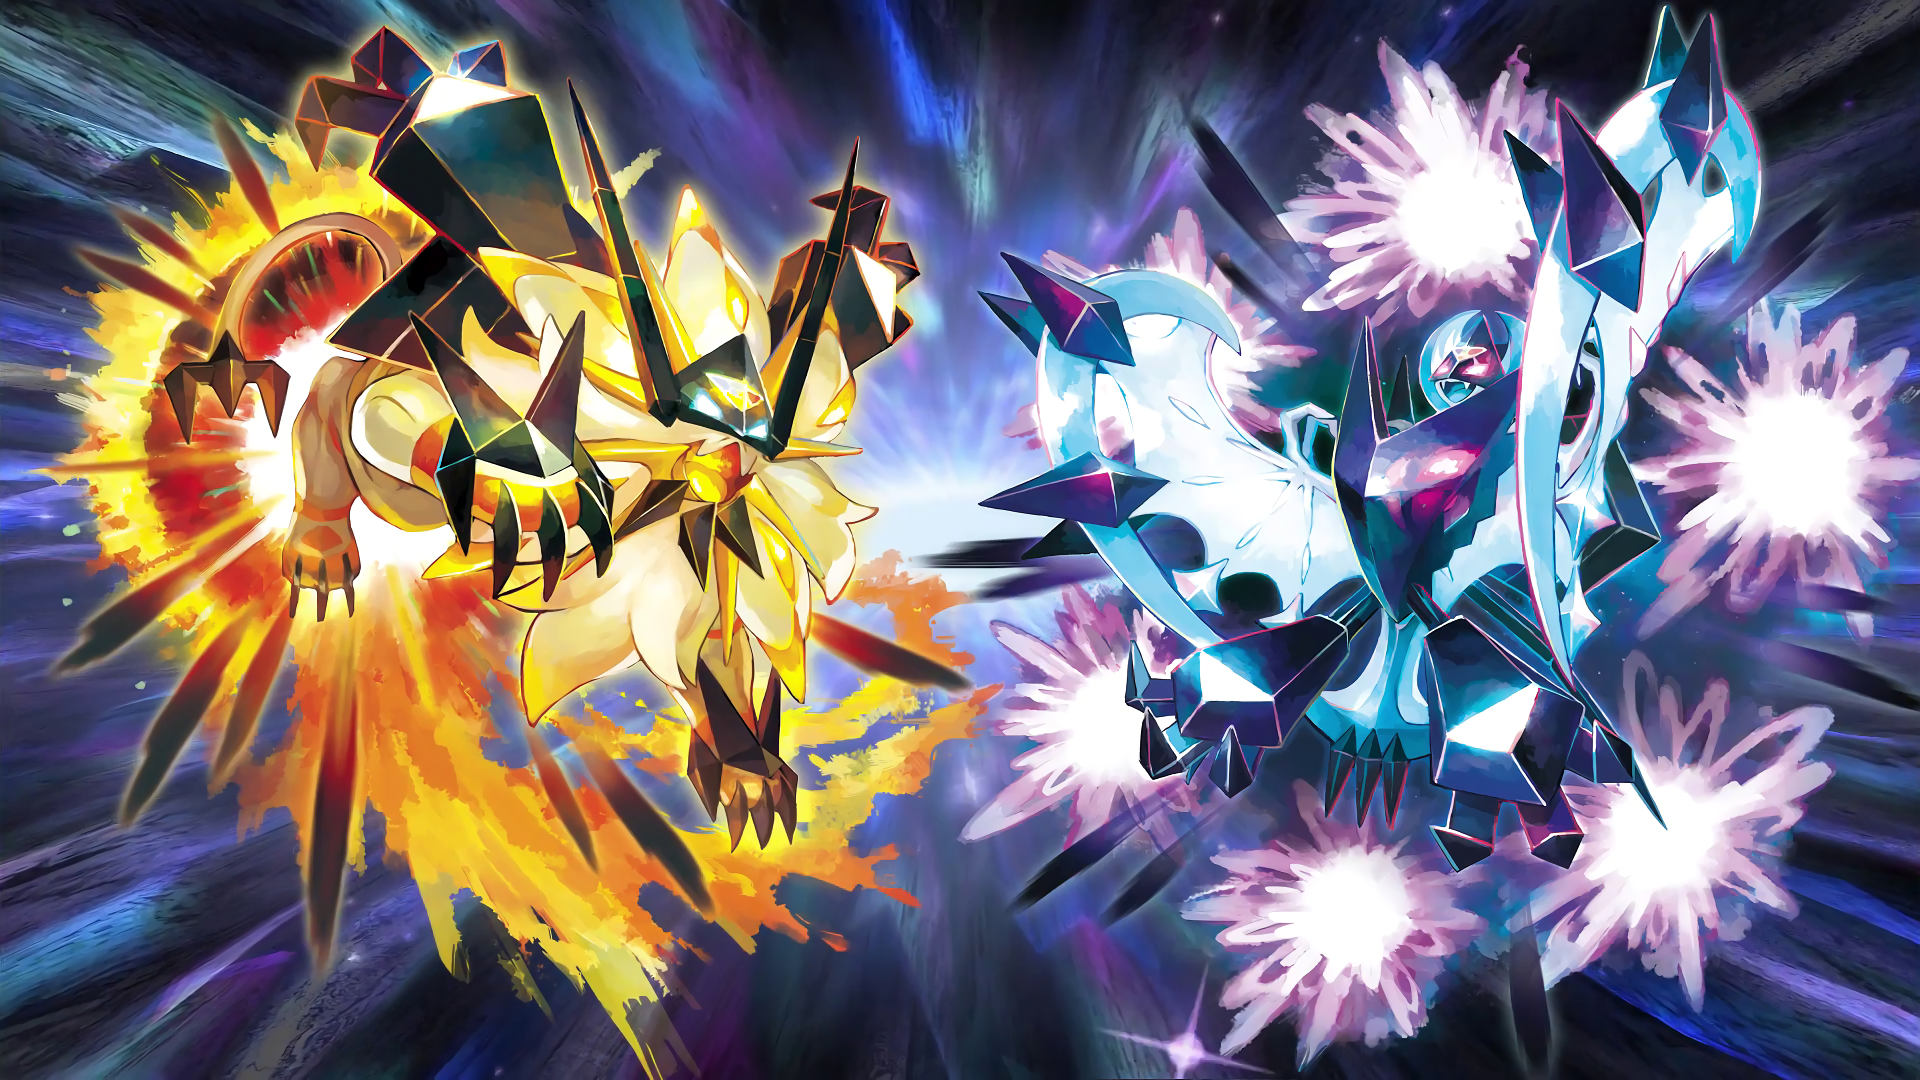 Legendary Pokemon Wallpapers 4k In 2020 Cool Pokemon Wallpapers Pokemon Painting Dog Pokemon